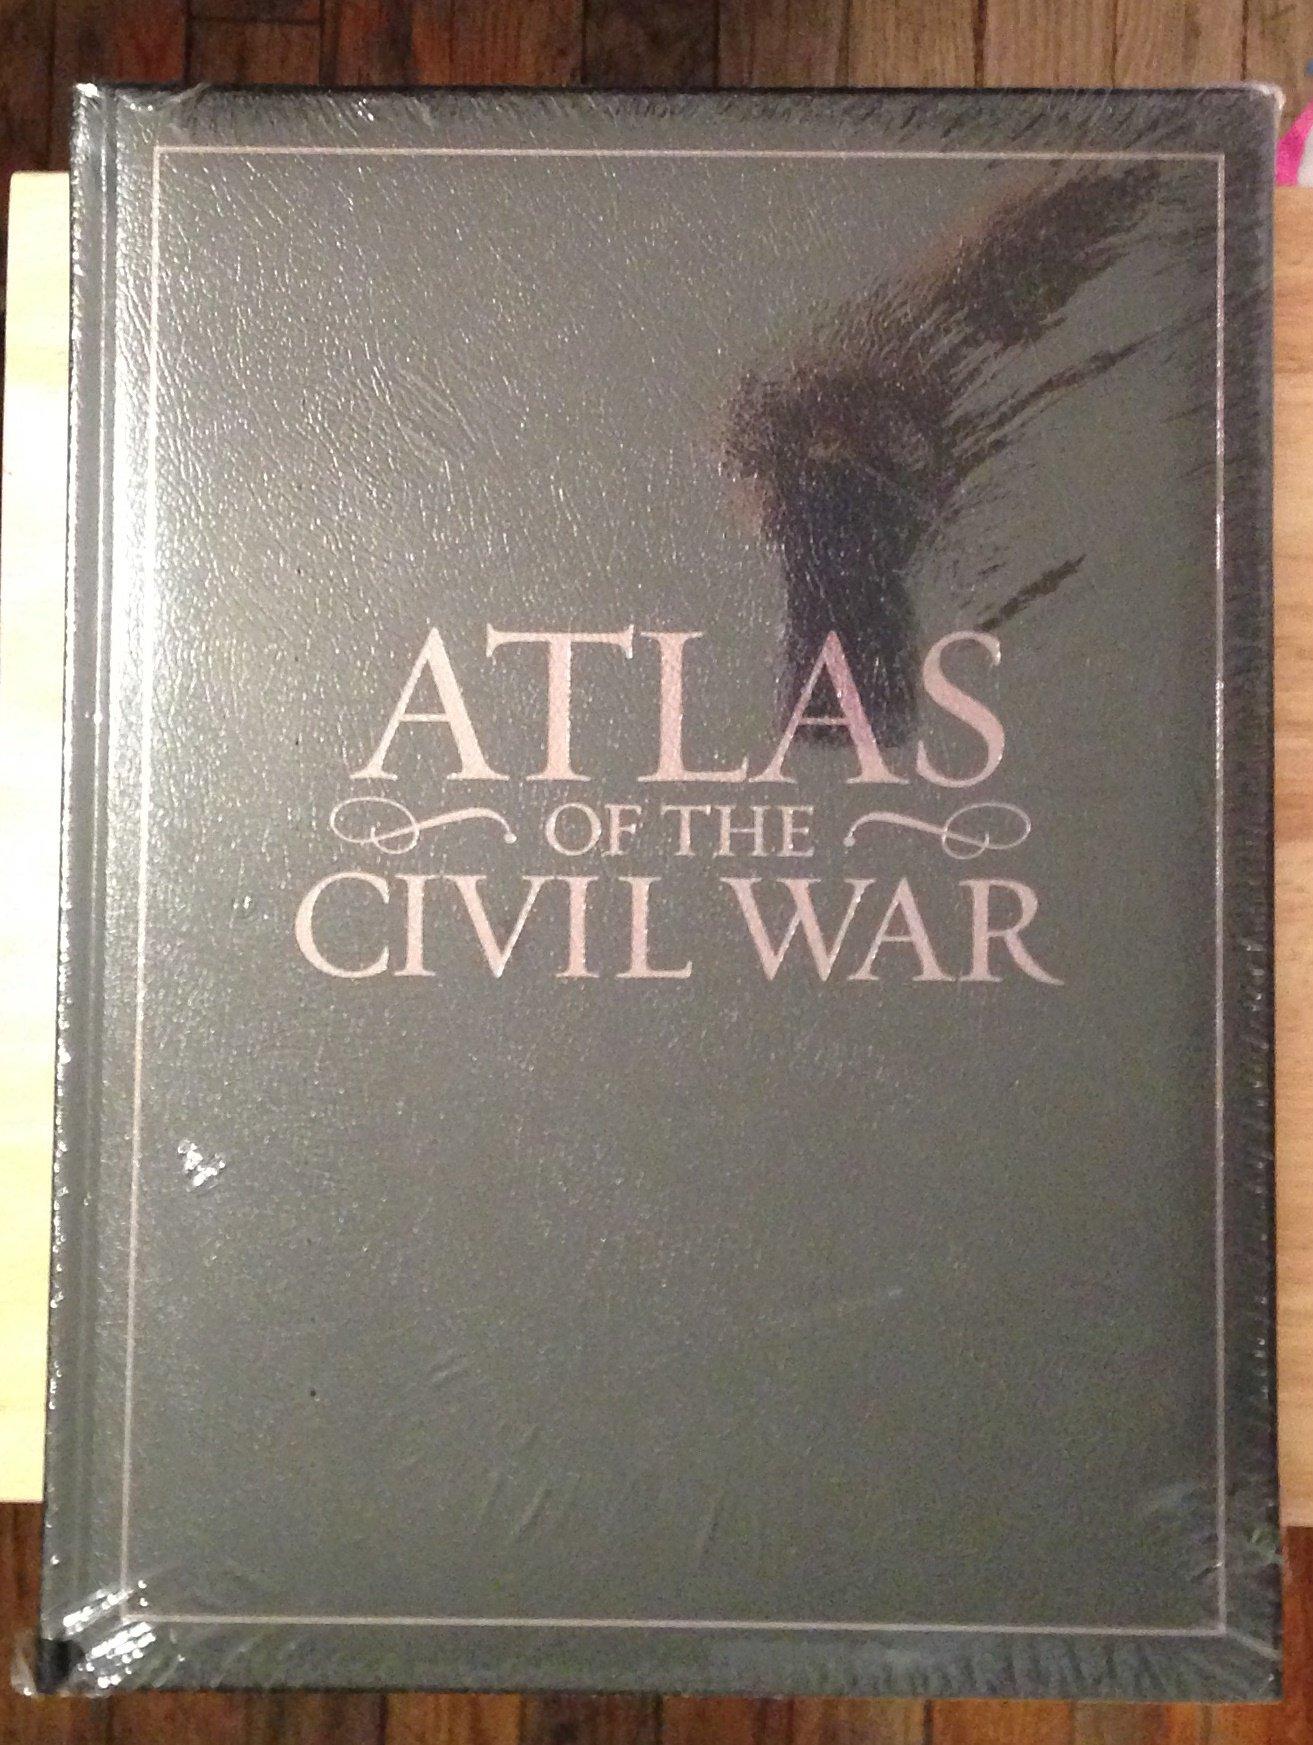 Atlas of the Civil War, Neil Kagan